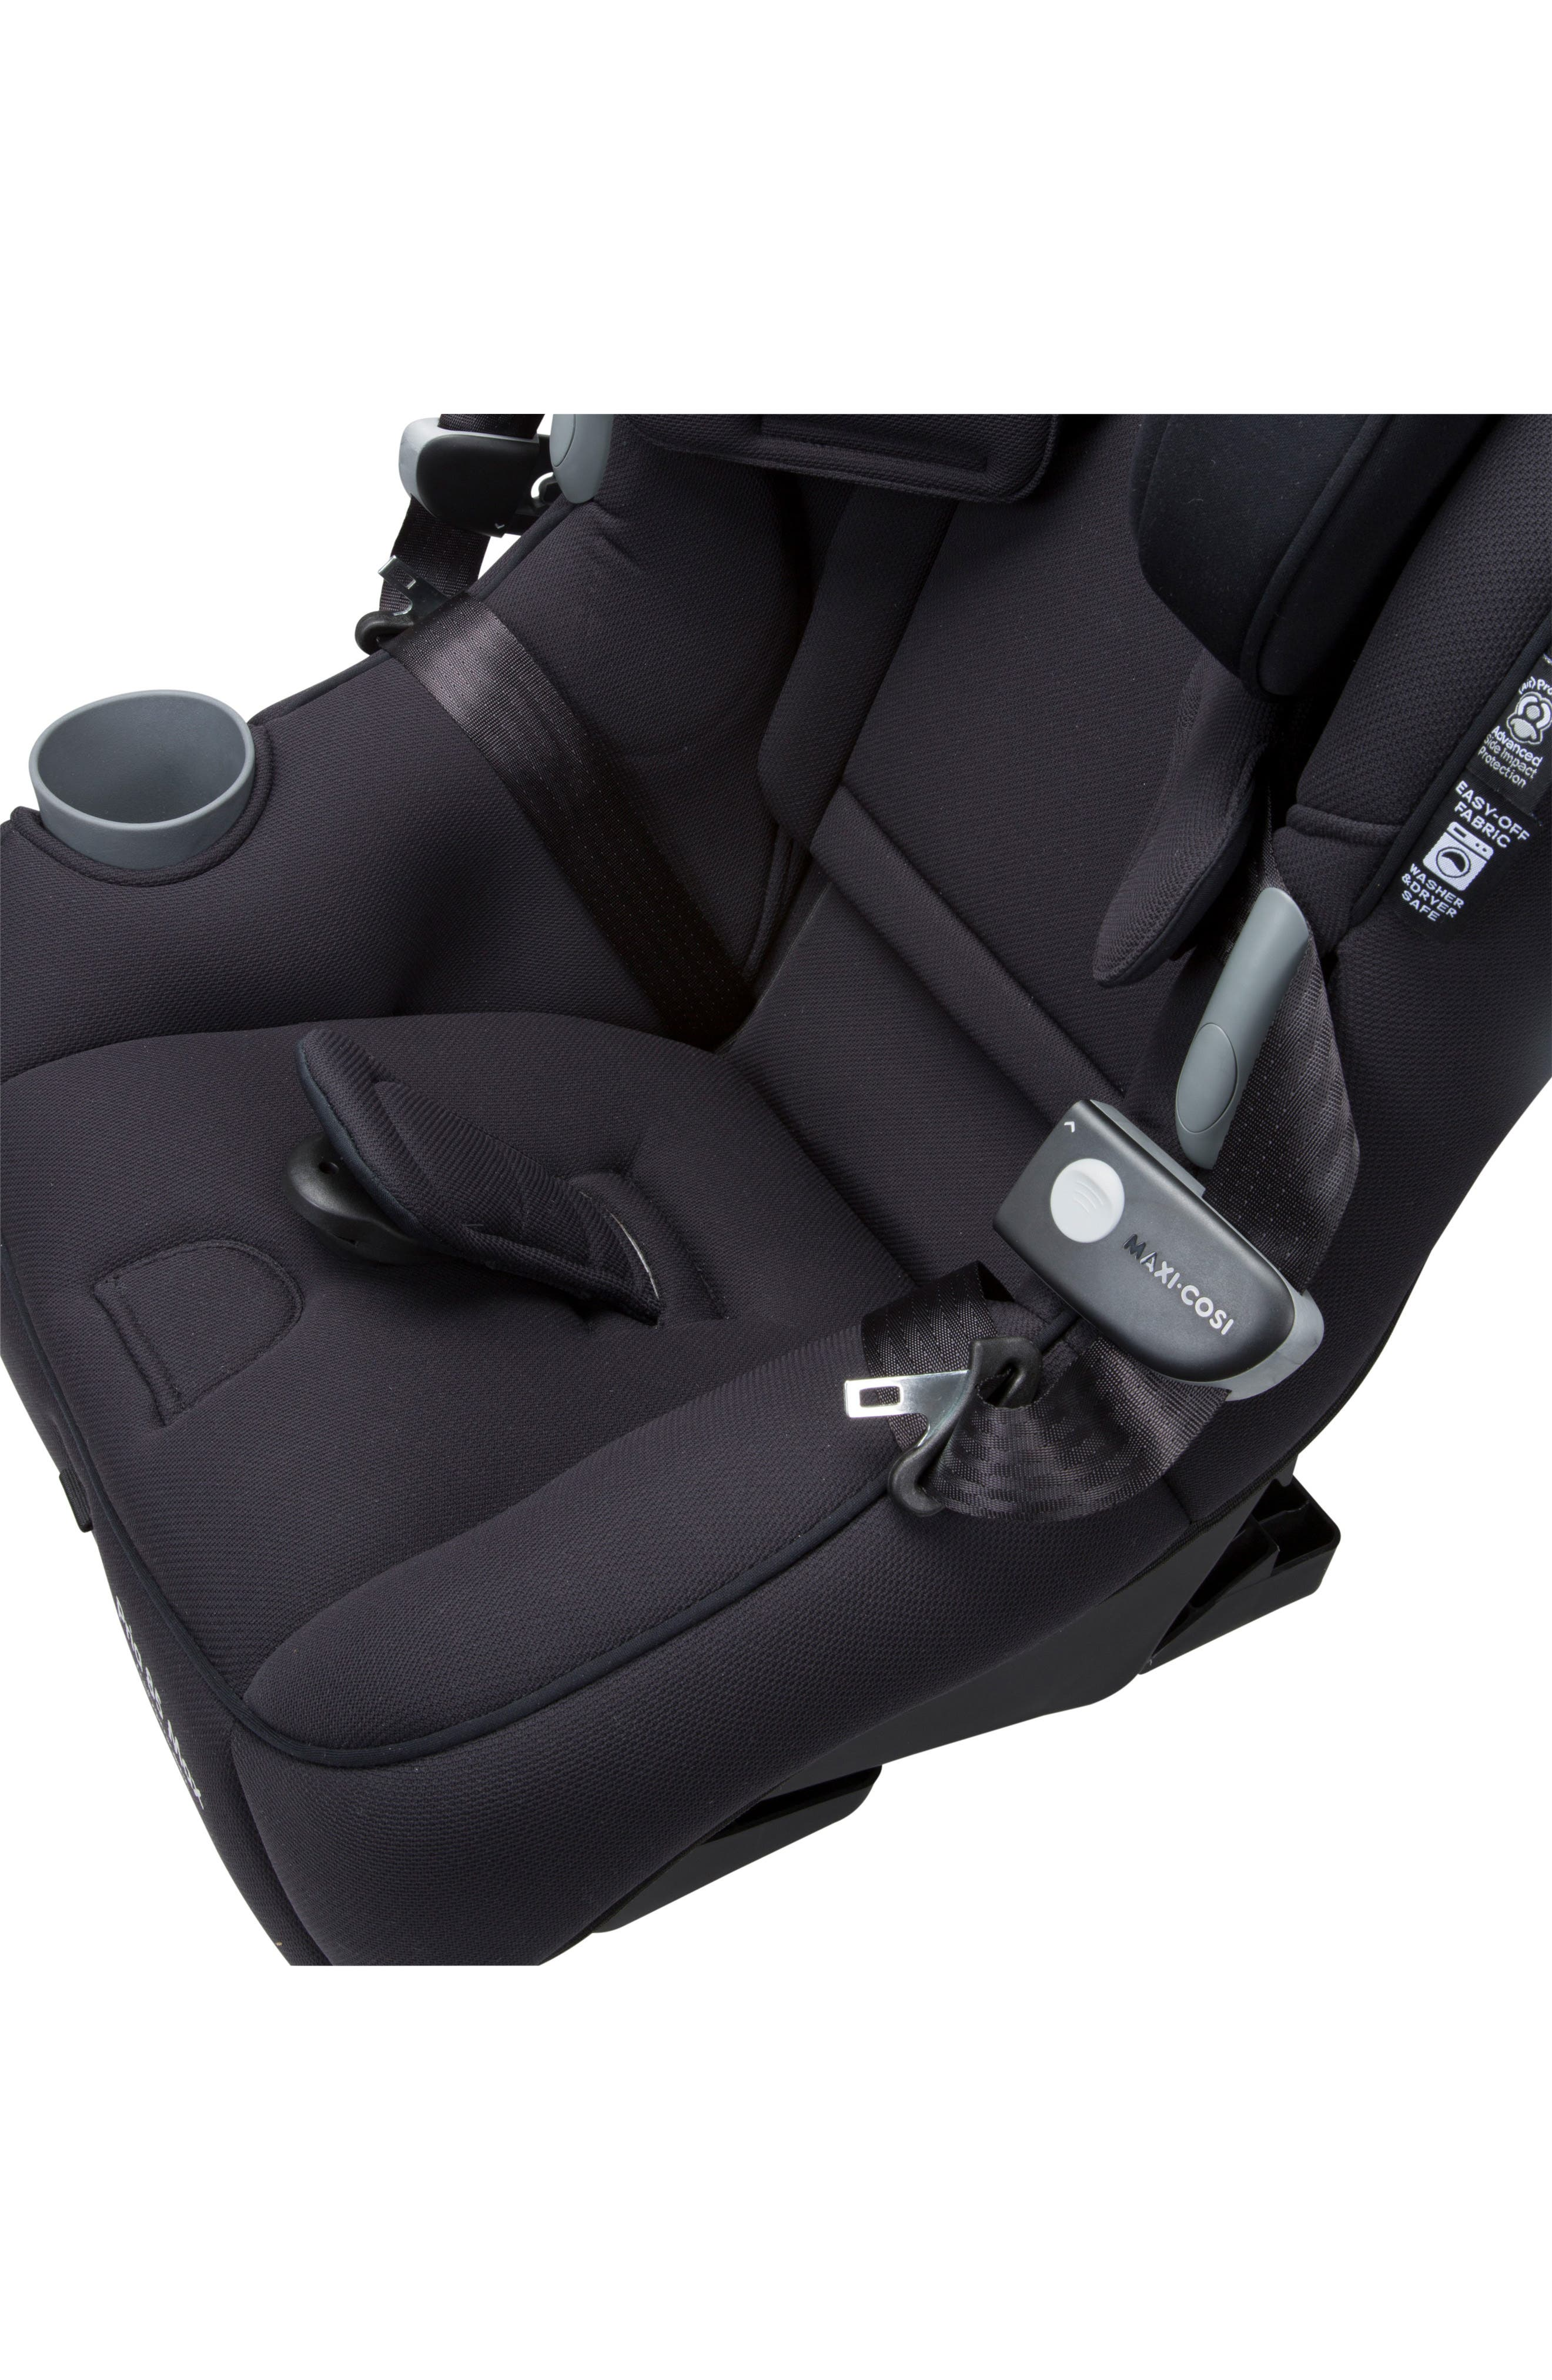 Pria<sup>™</sup> 85 Max Convertible Car Seat,                             Alternate thumbnail 10, color,                             Night Black